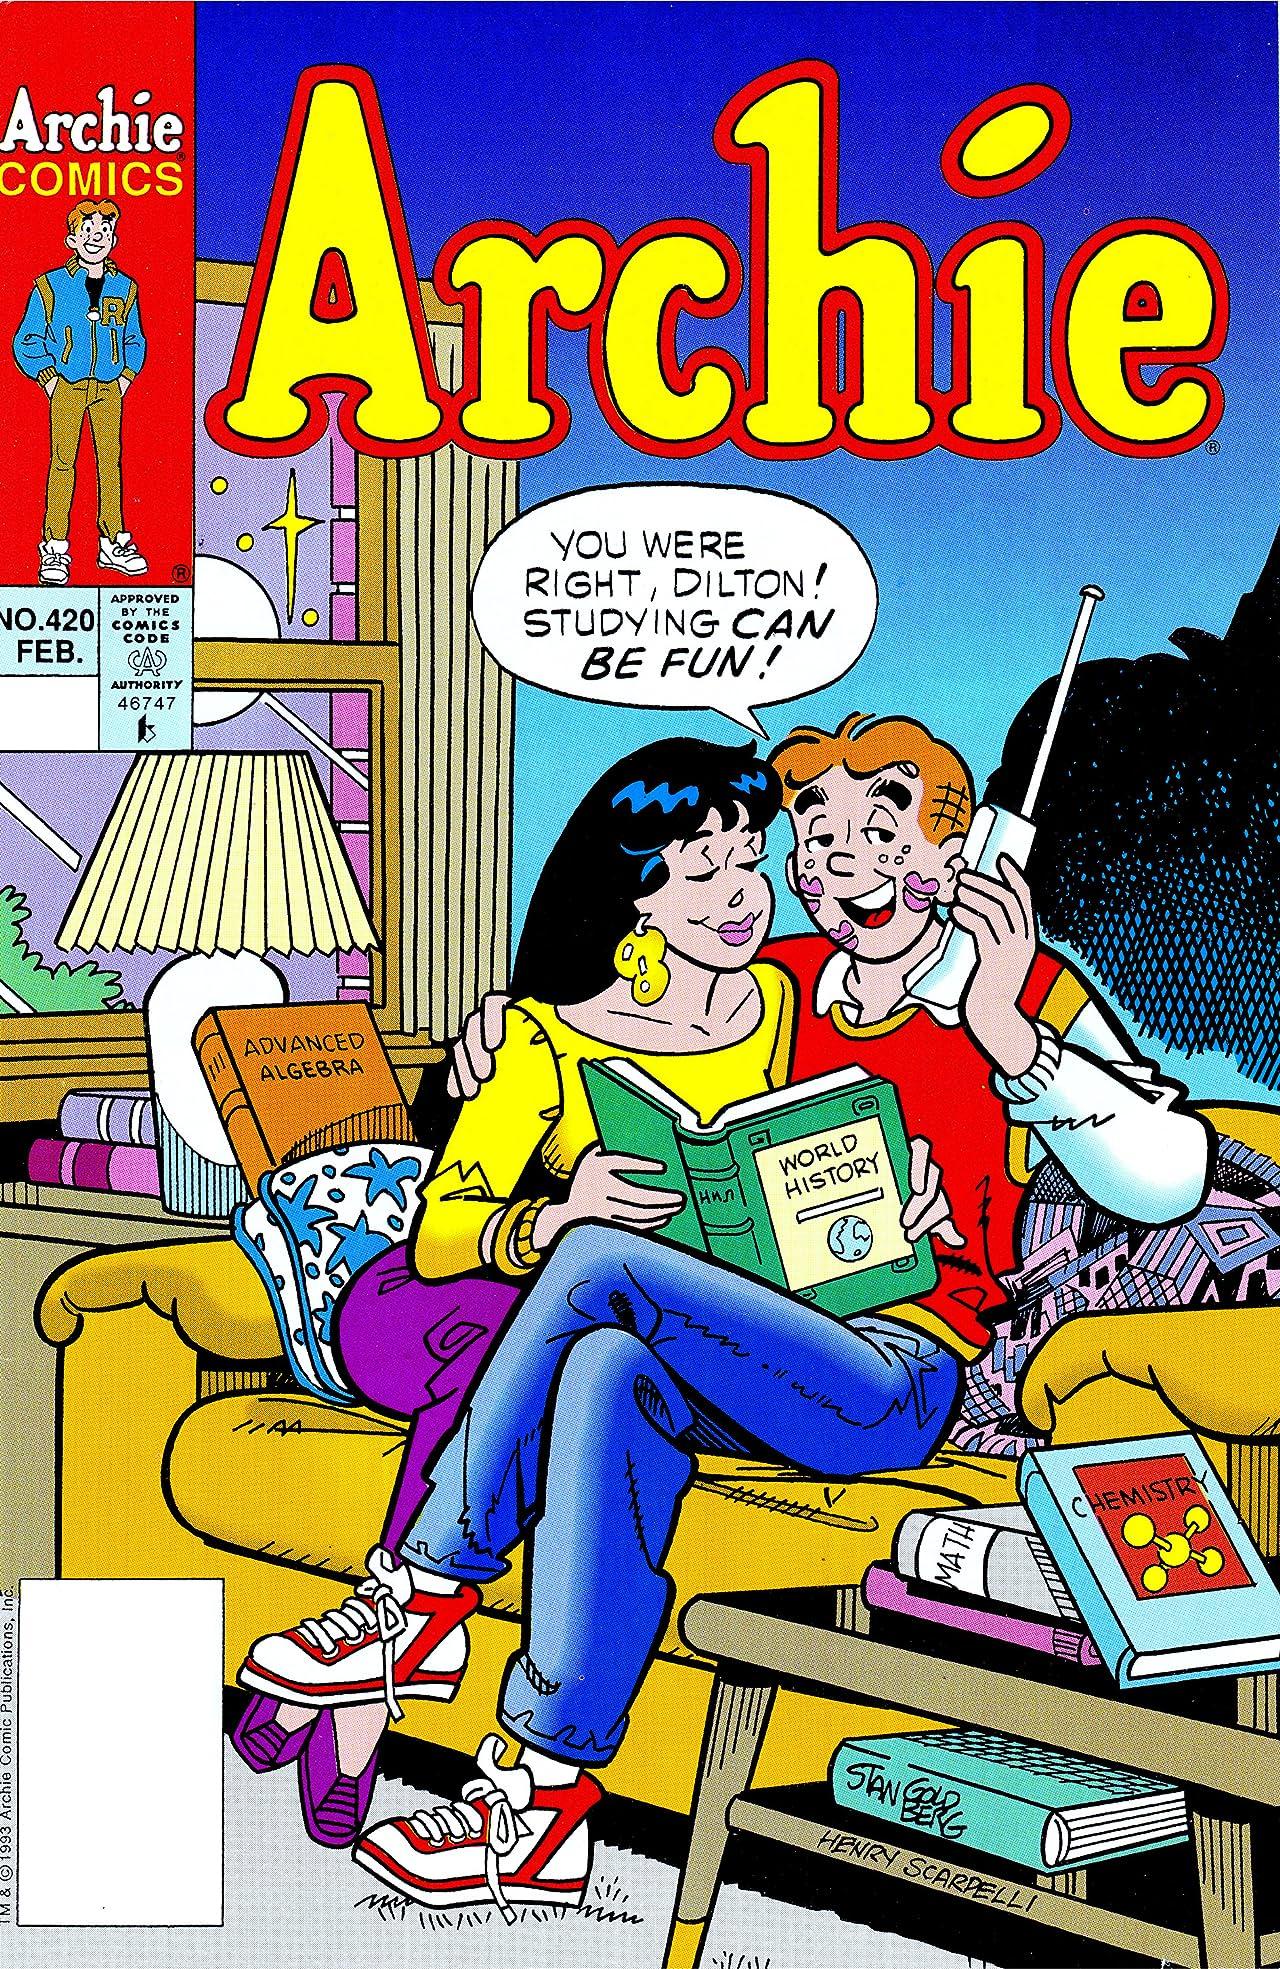 Archie #420